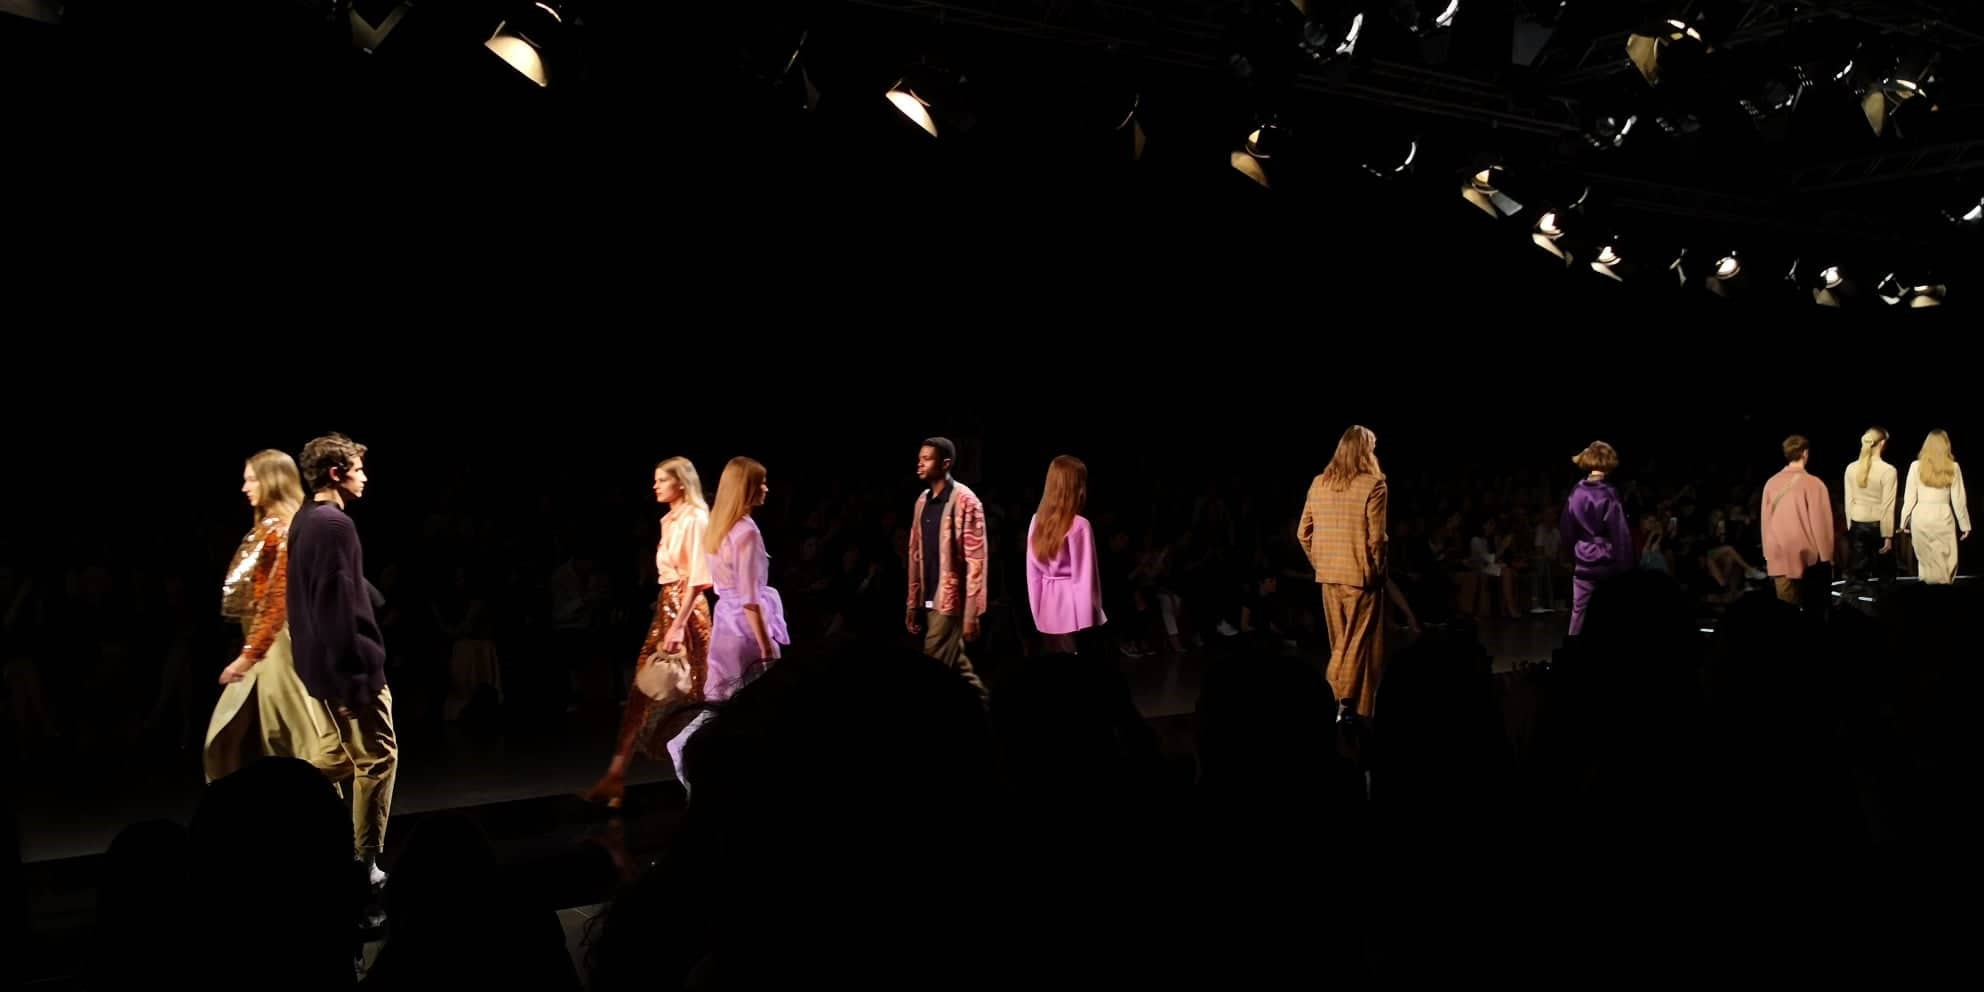 eskuvo-classic-budapest-central-european-fashion-week-blog-9.jpg